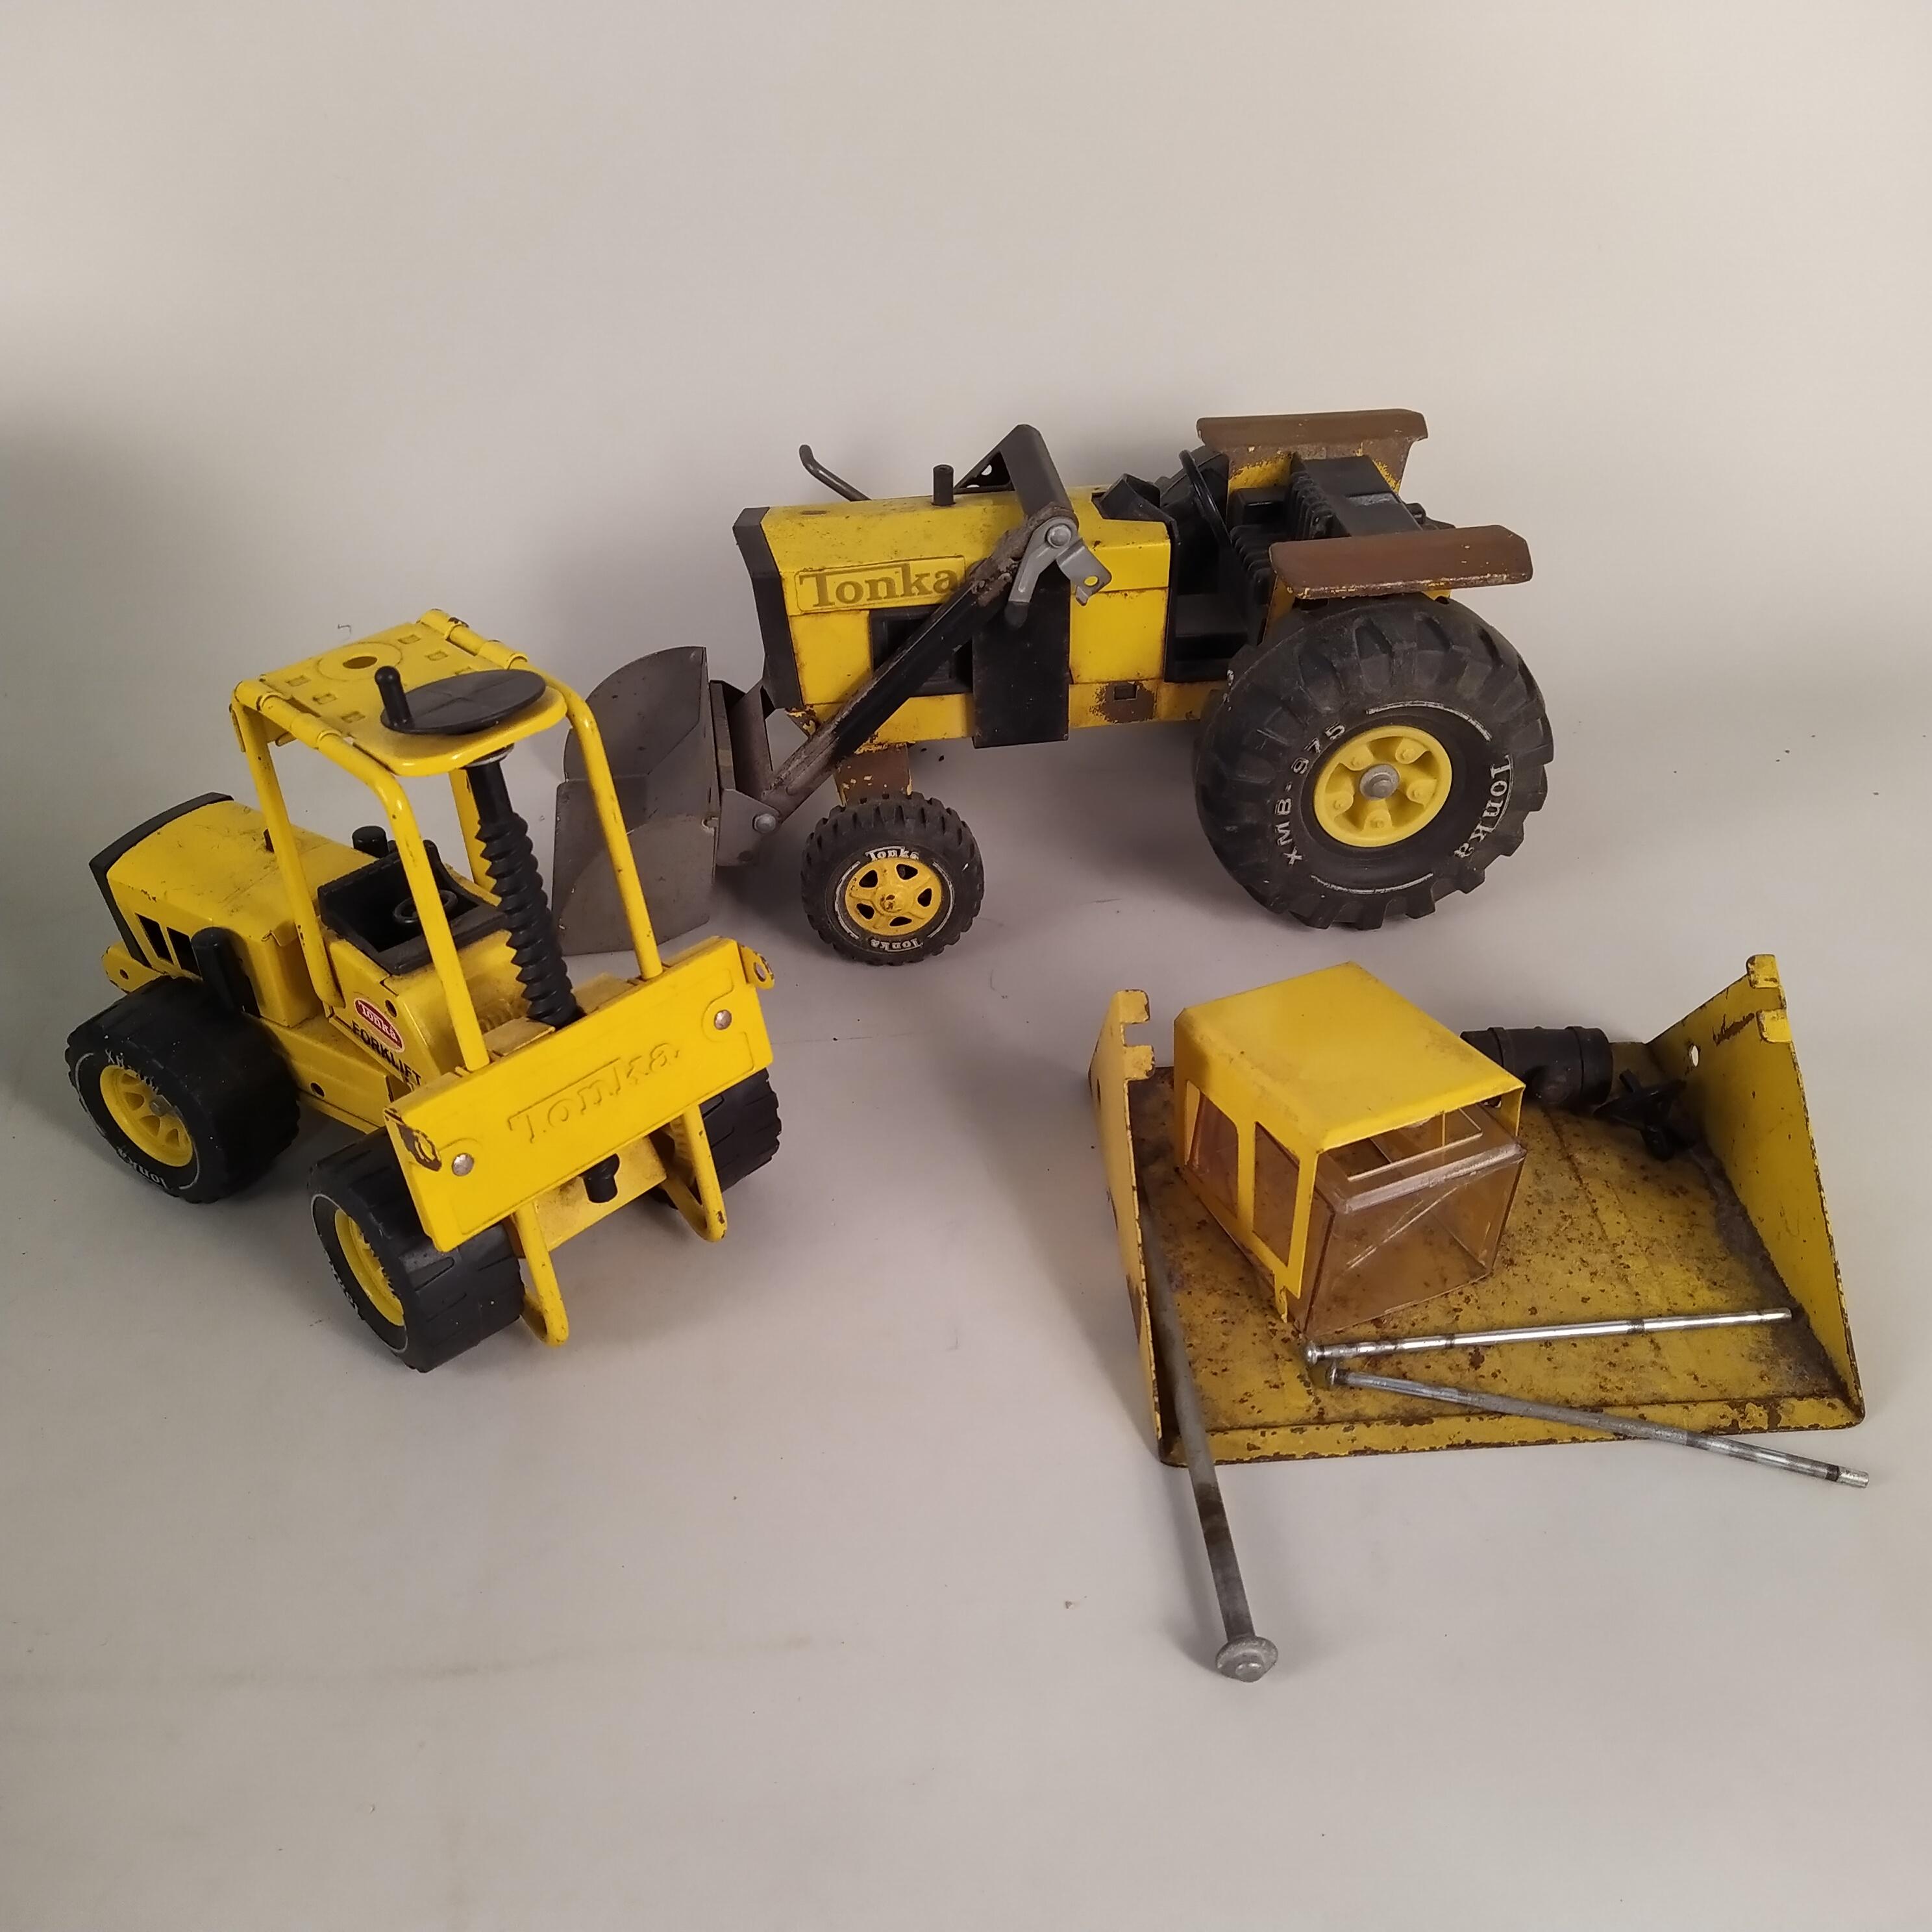 A mixed box of Tonka vehicles and parts (playworn)